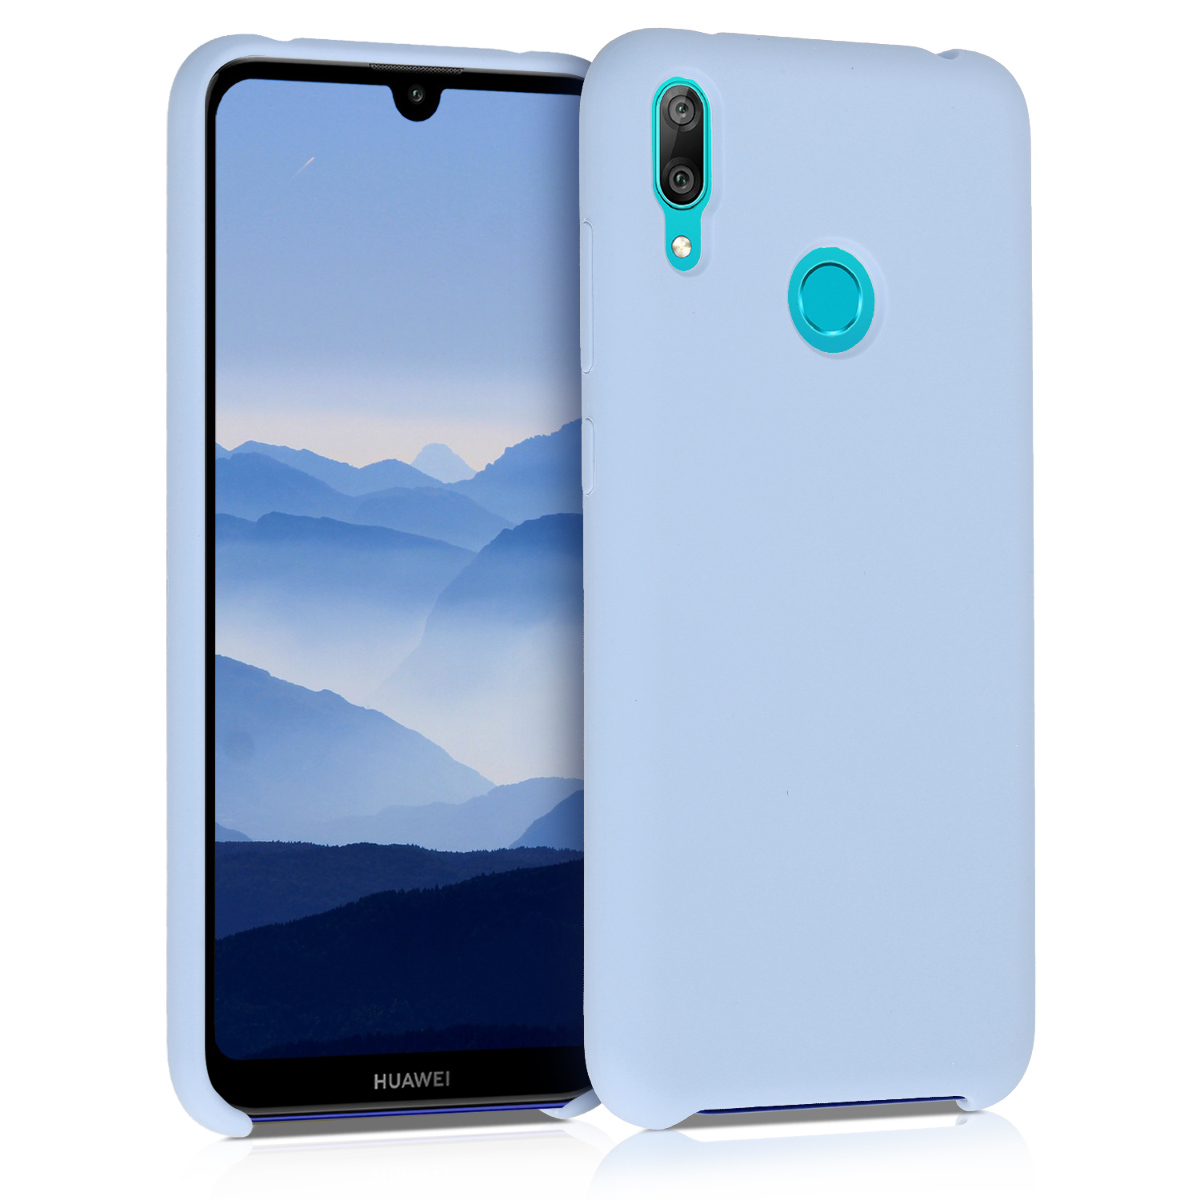 KW Θήκη Σιλικόνης Huawei Y7 2019 / Y7 Prime 2019 - Soft Flexible Rubber - Light Blue Matte (50686.58)